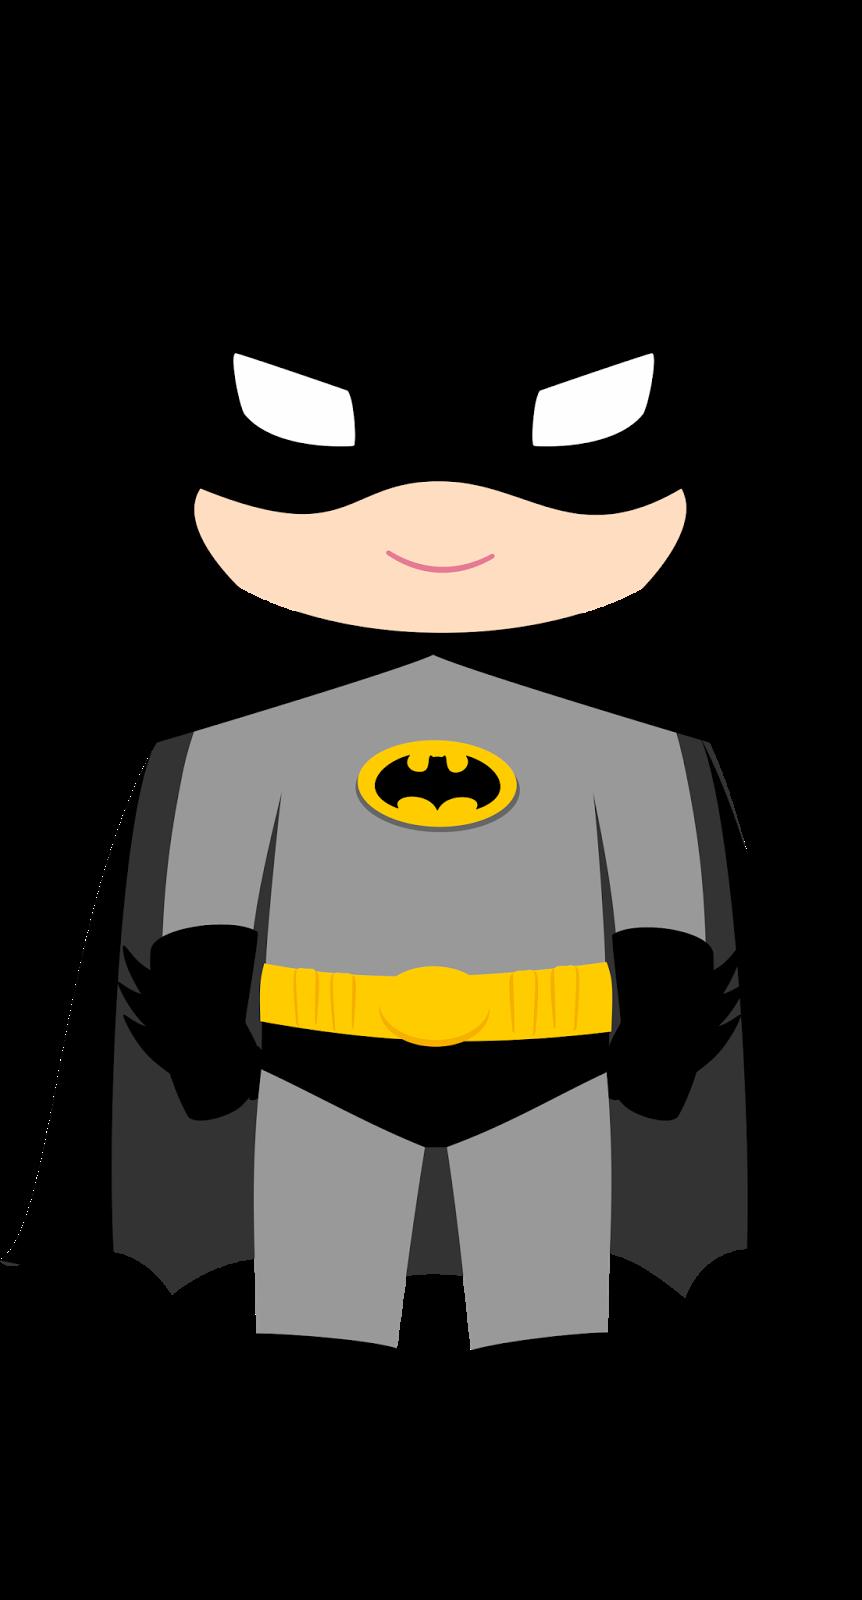 Gifs Y Fondos Pazenlatormenta Im Genes De Batman Para Ni Os.